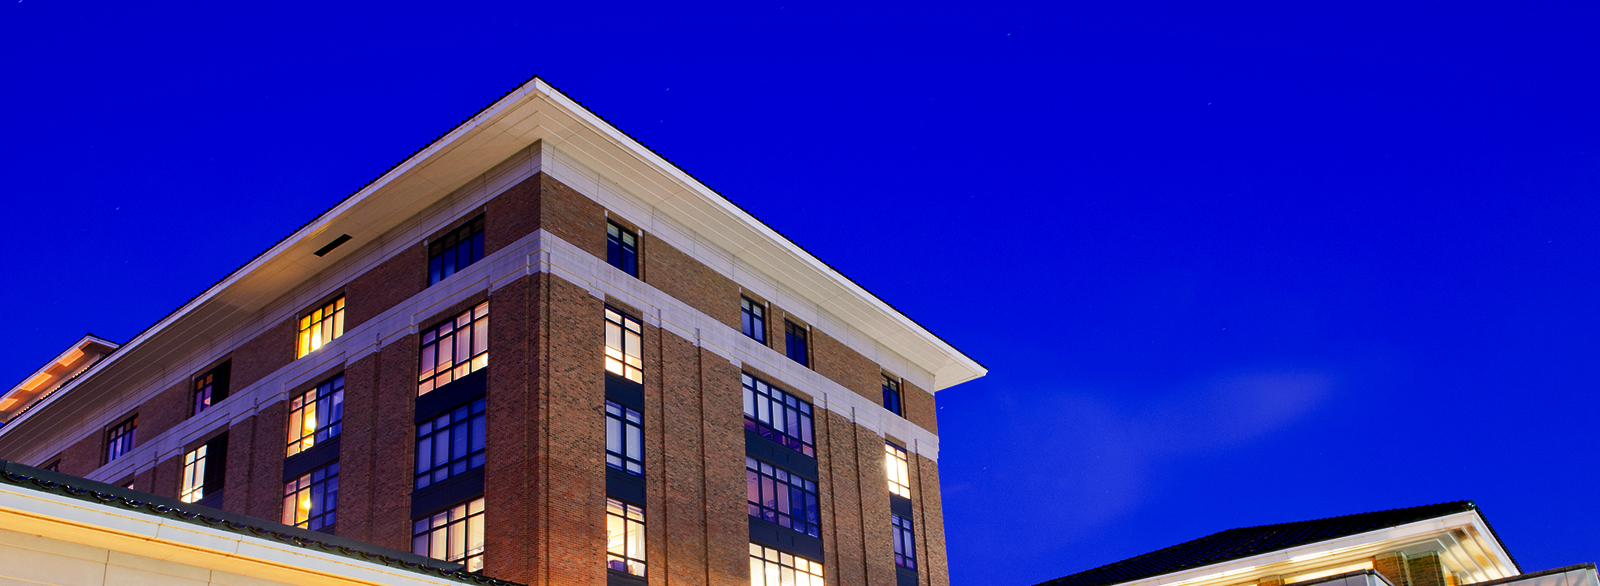 Columbus Regional Hospital exterior, night